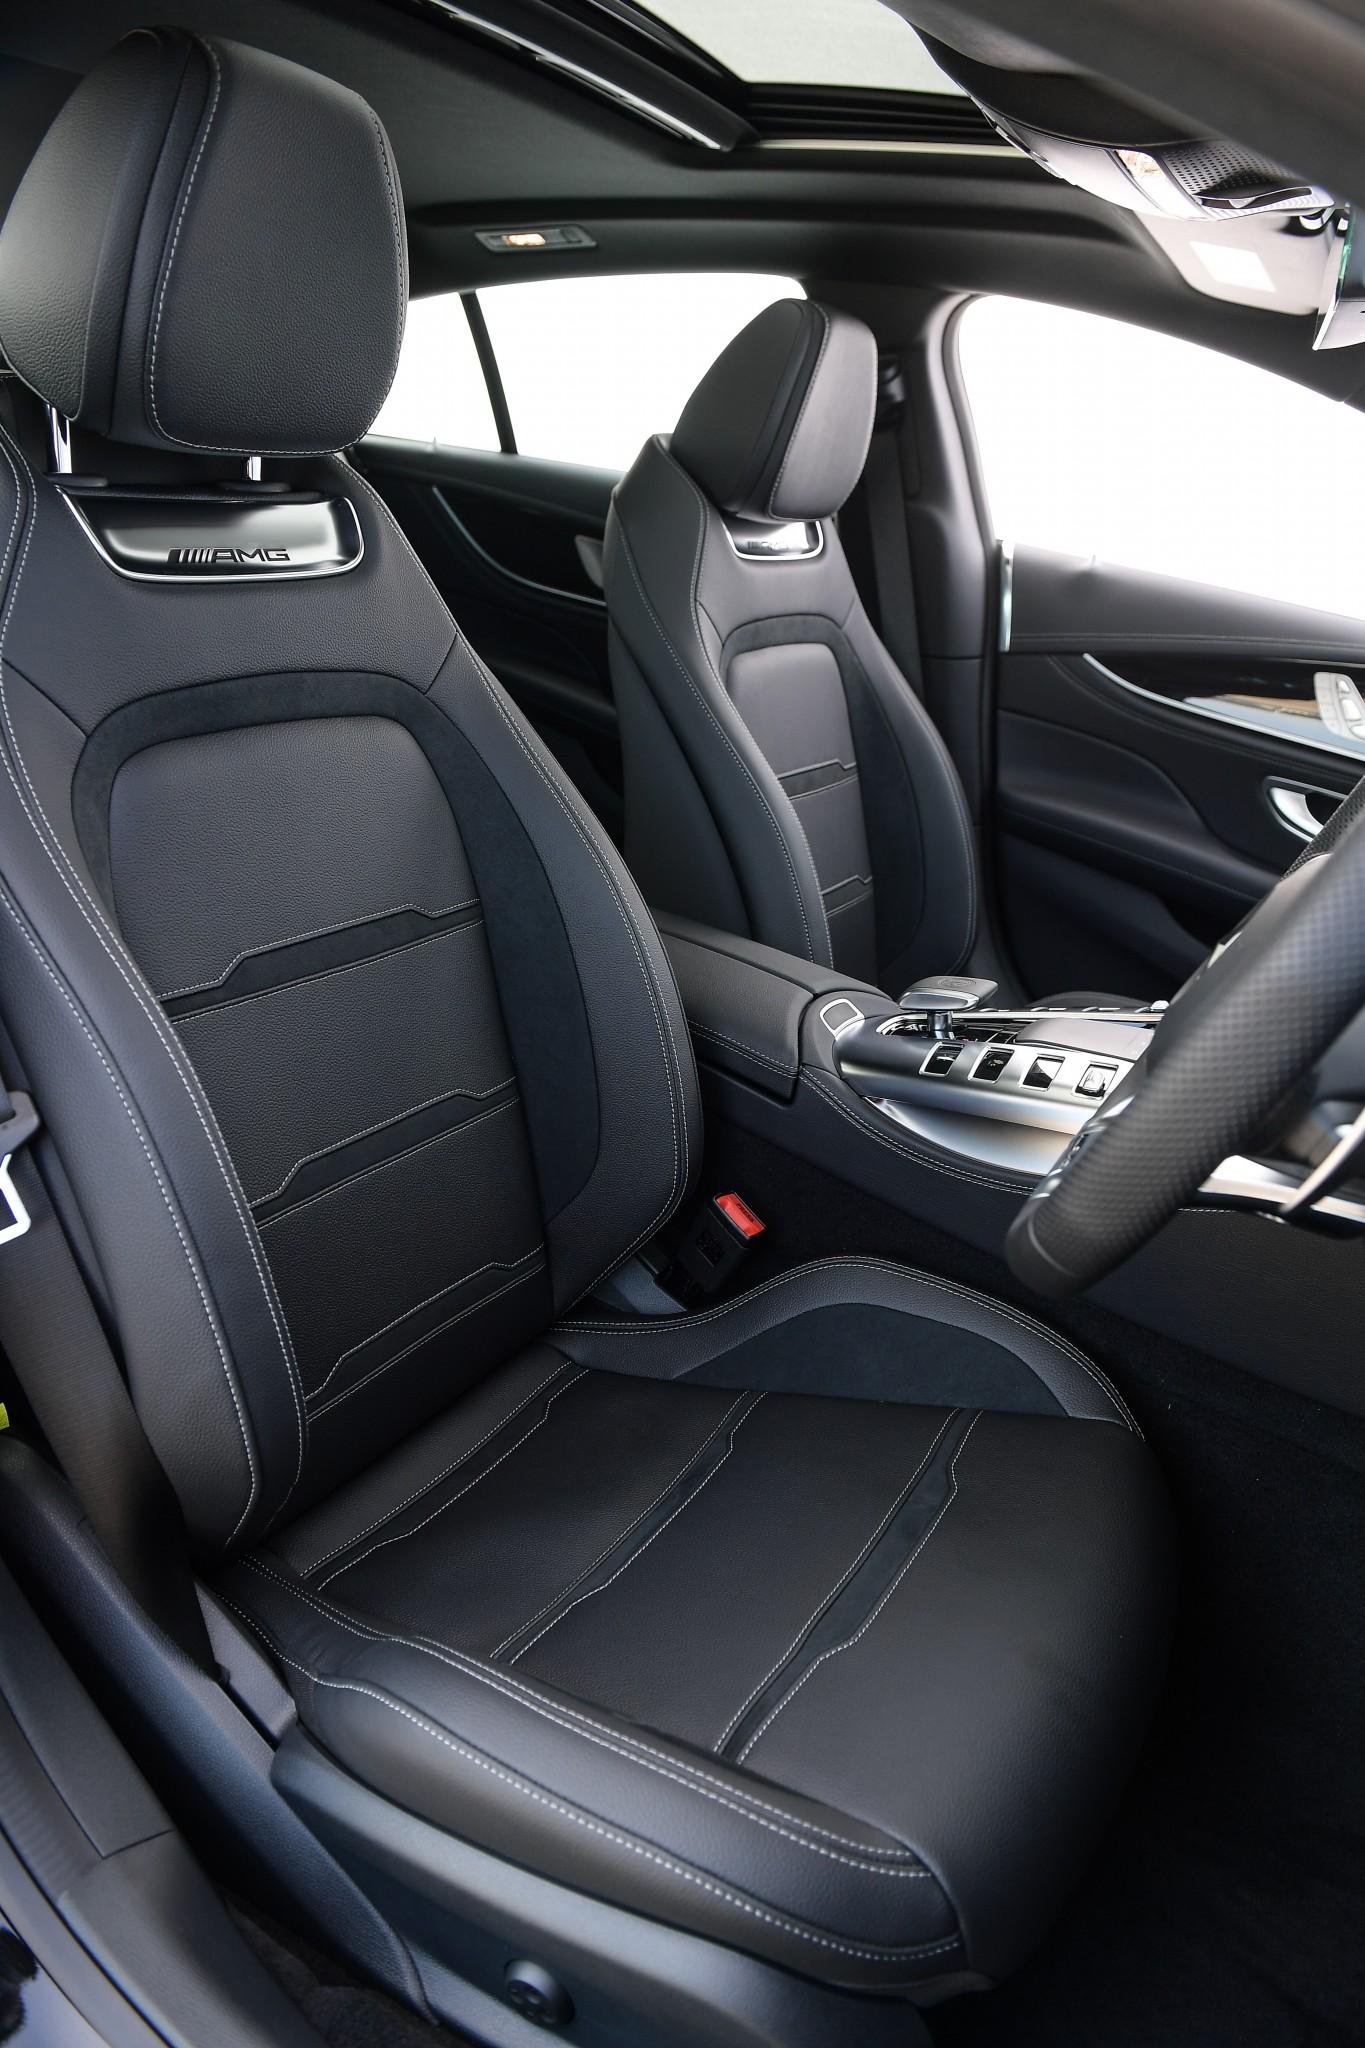 Mercedes-AMG GT 53 4MATIC+ 4-Door Coupe (Interior) (28)